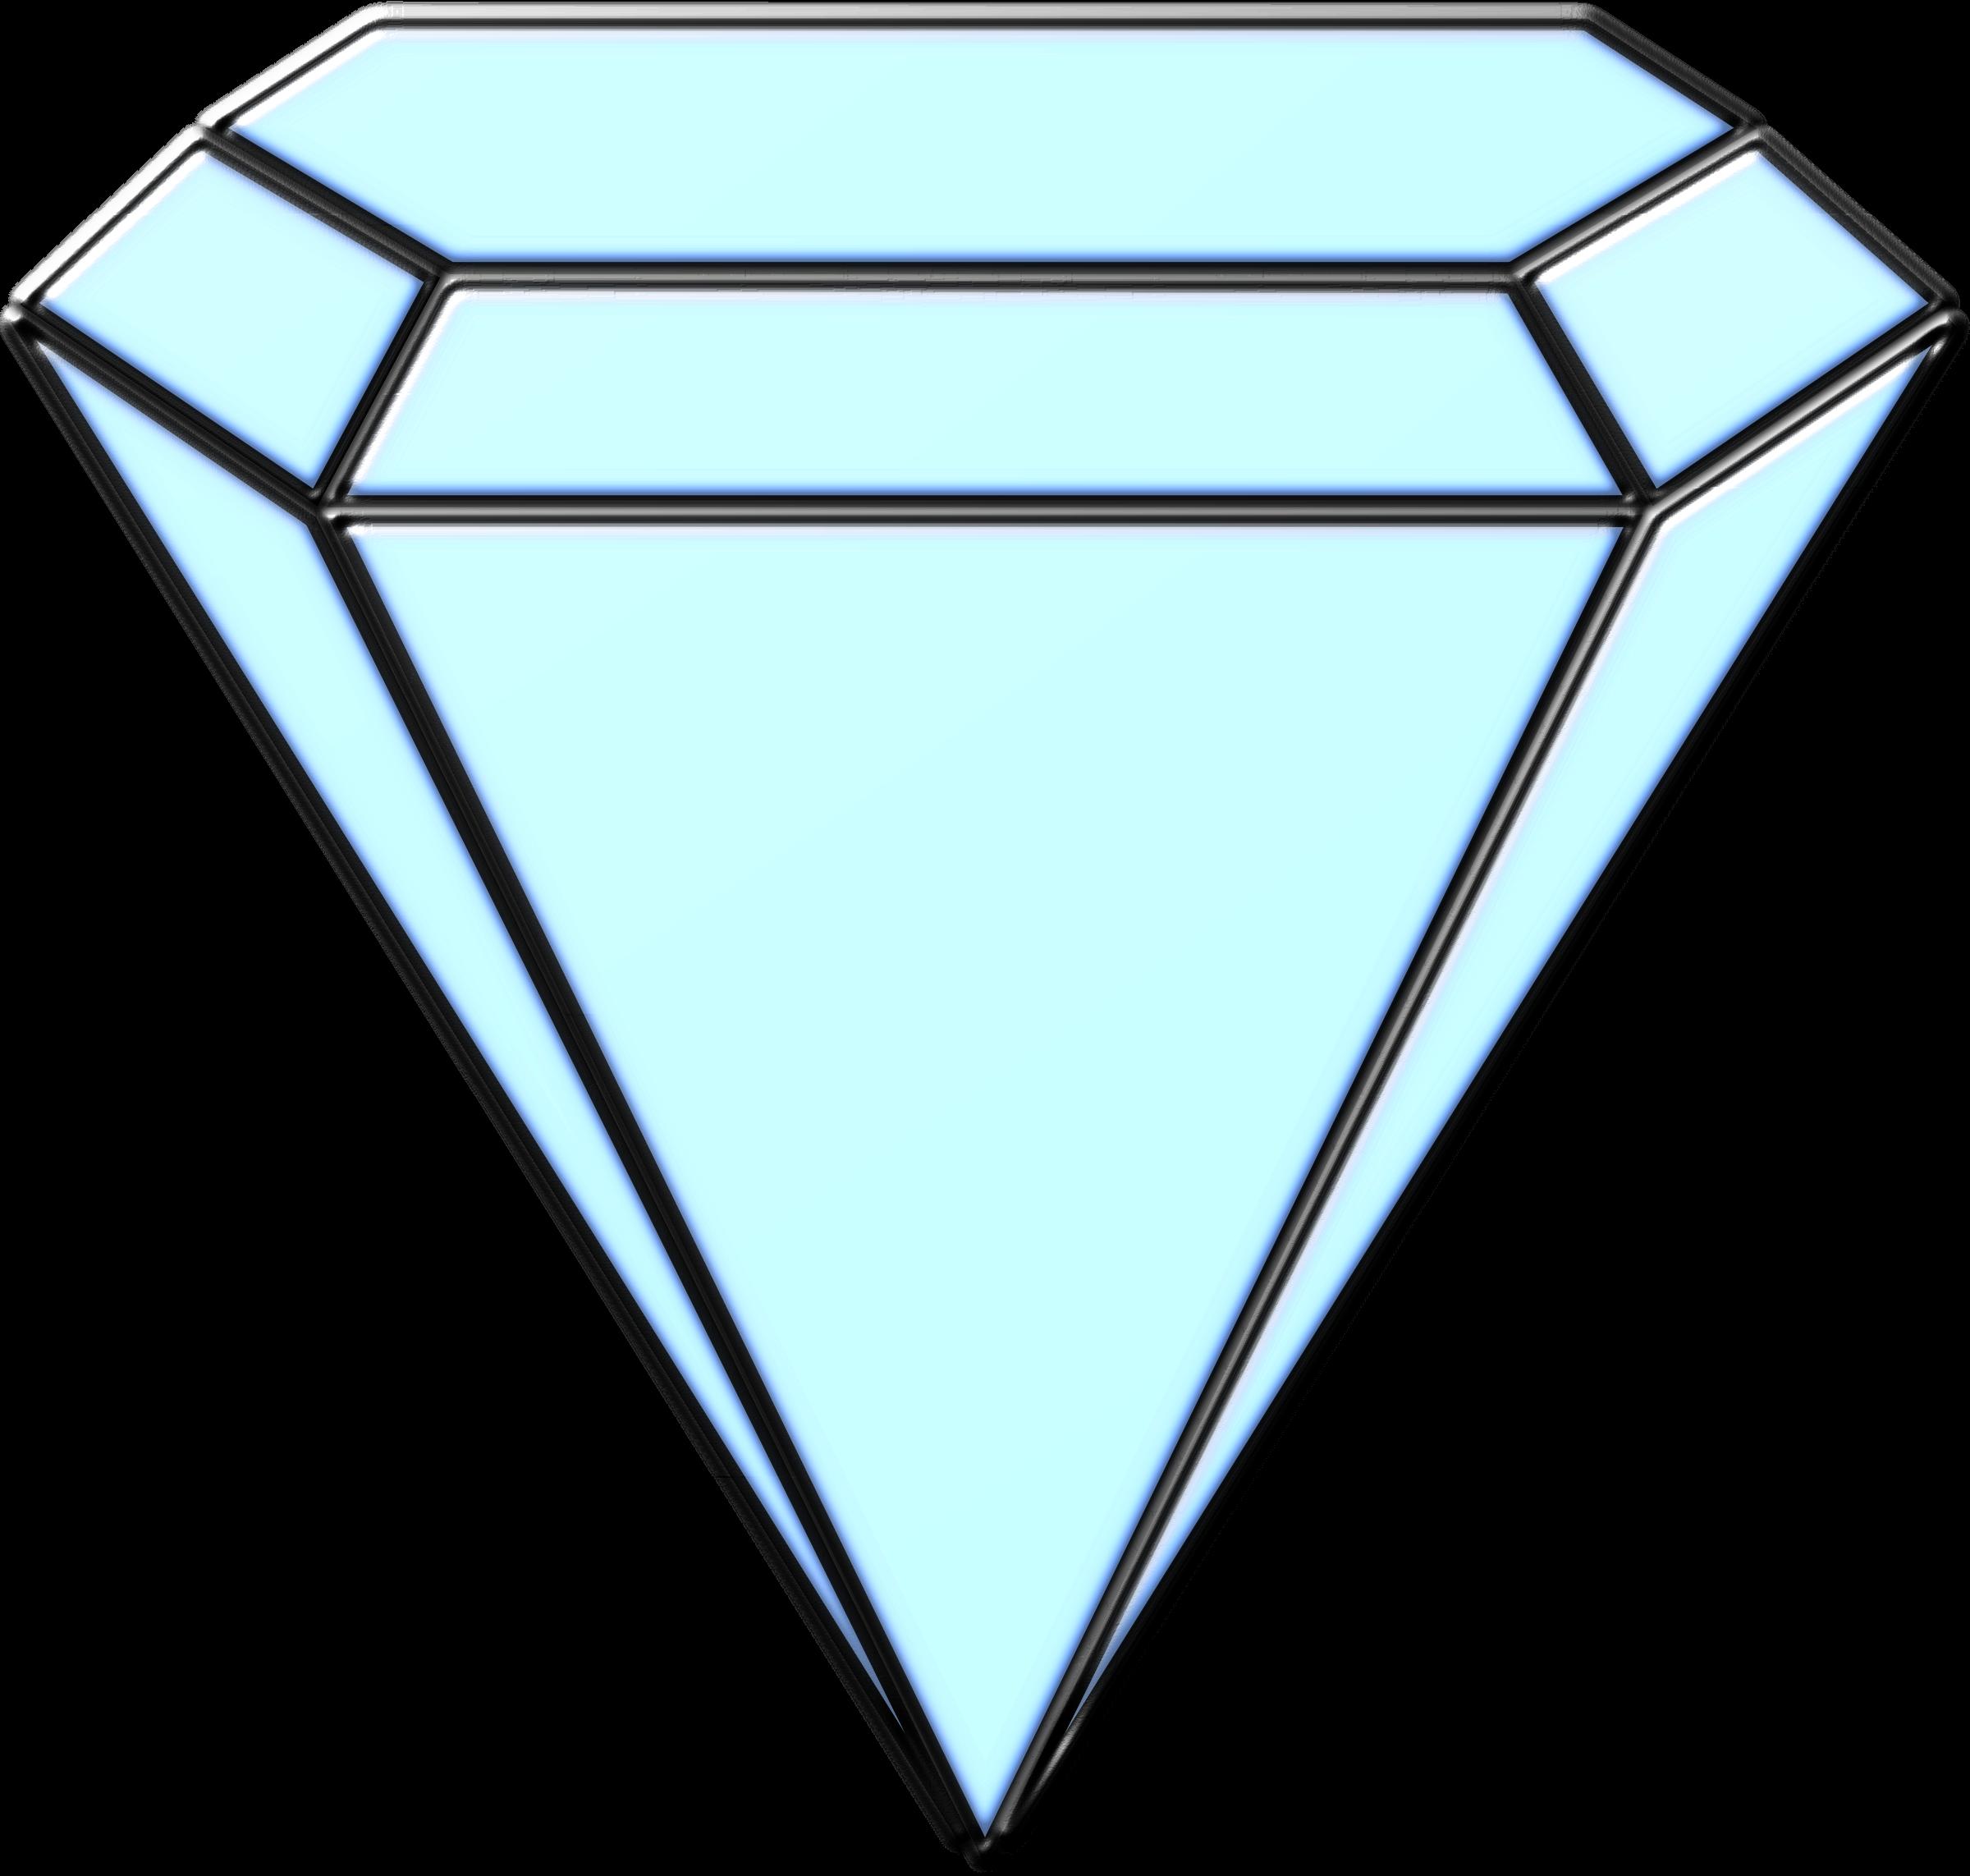 2400x2285 Diamond Clip Art Images Free